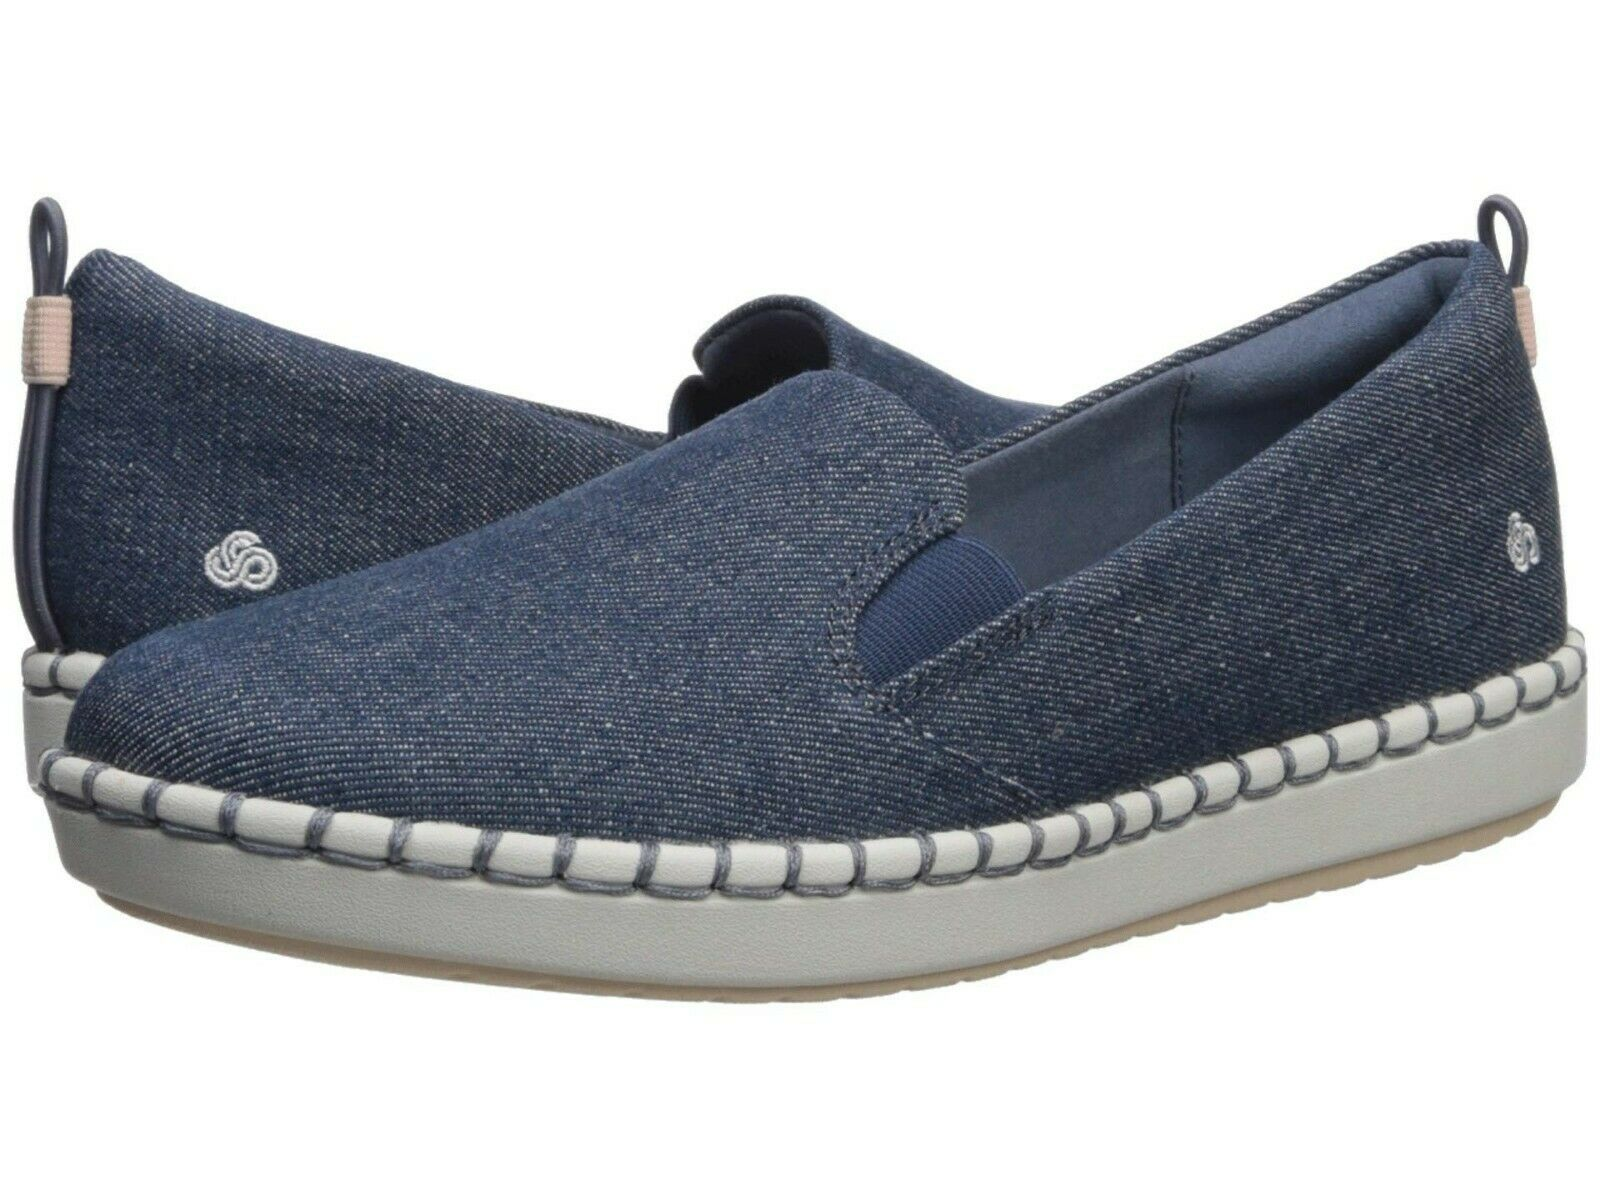 Women's Shoes Clarks Step Glow Slip On 41063 DENIM Textile *NEW*